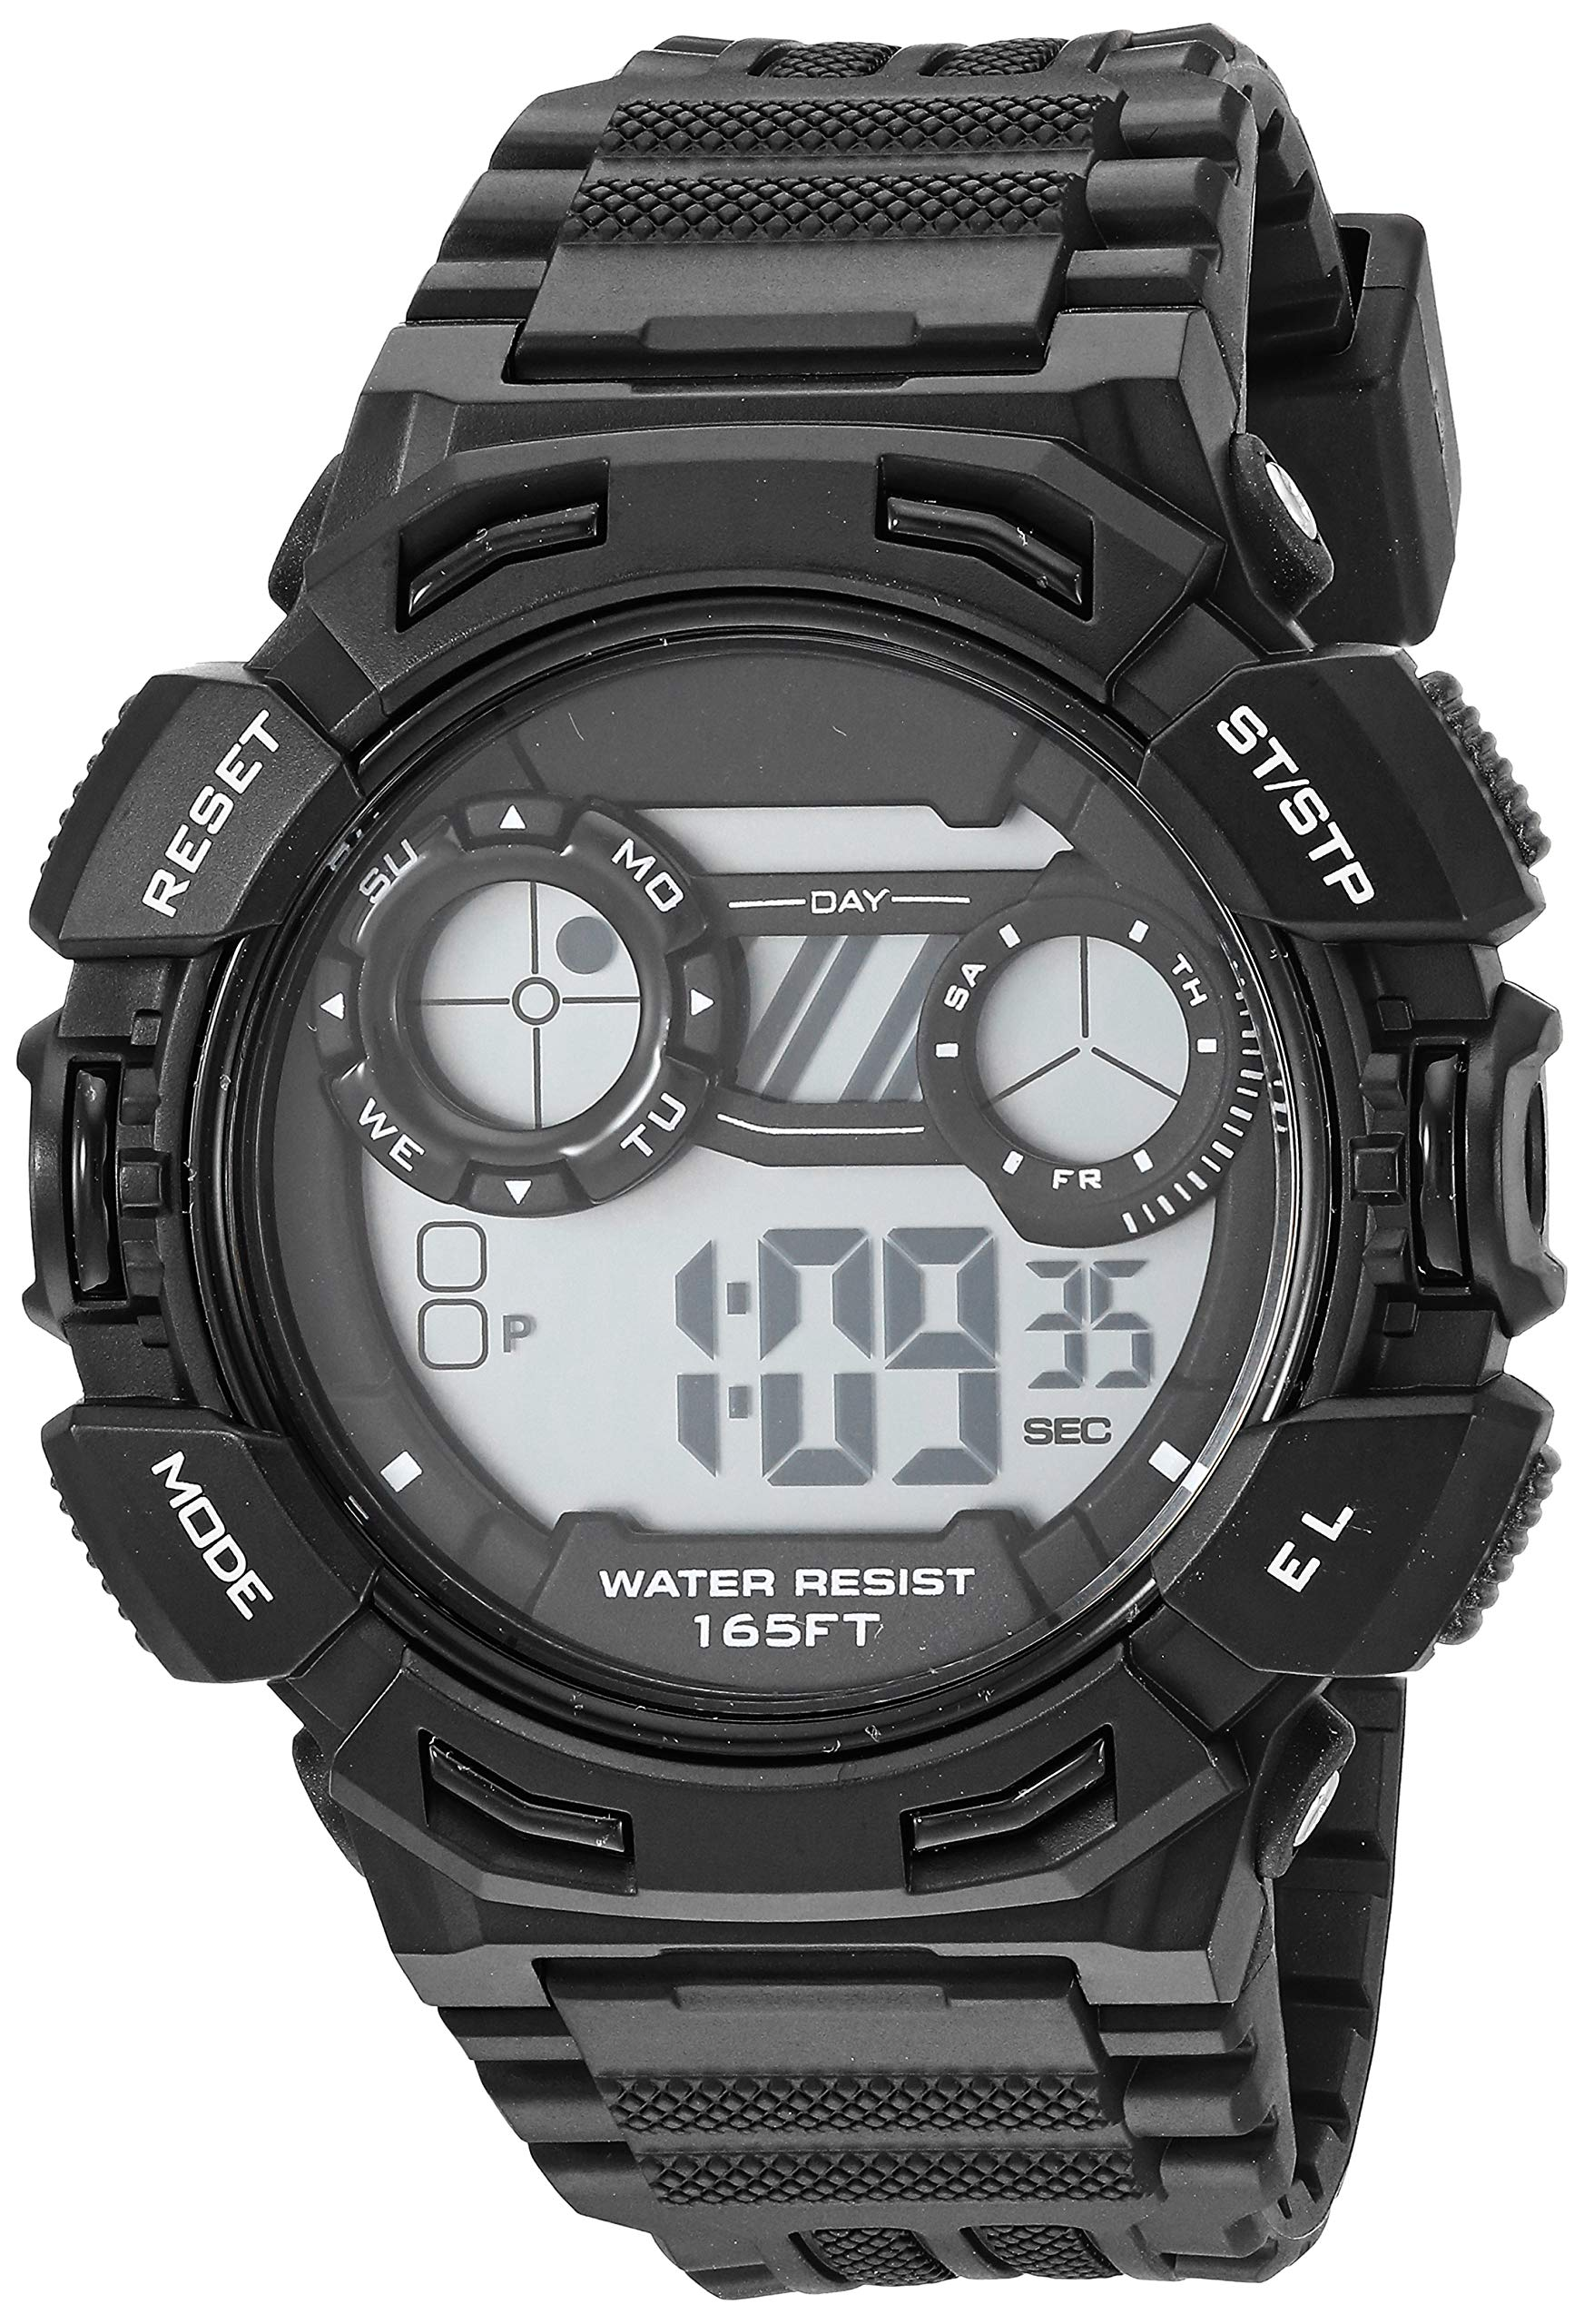 Men's Digital Chronograph Black Resin Strap Watch